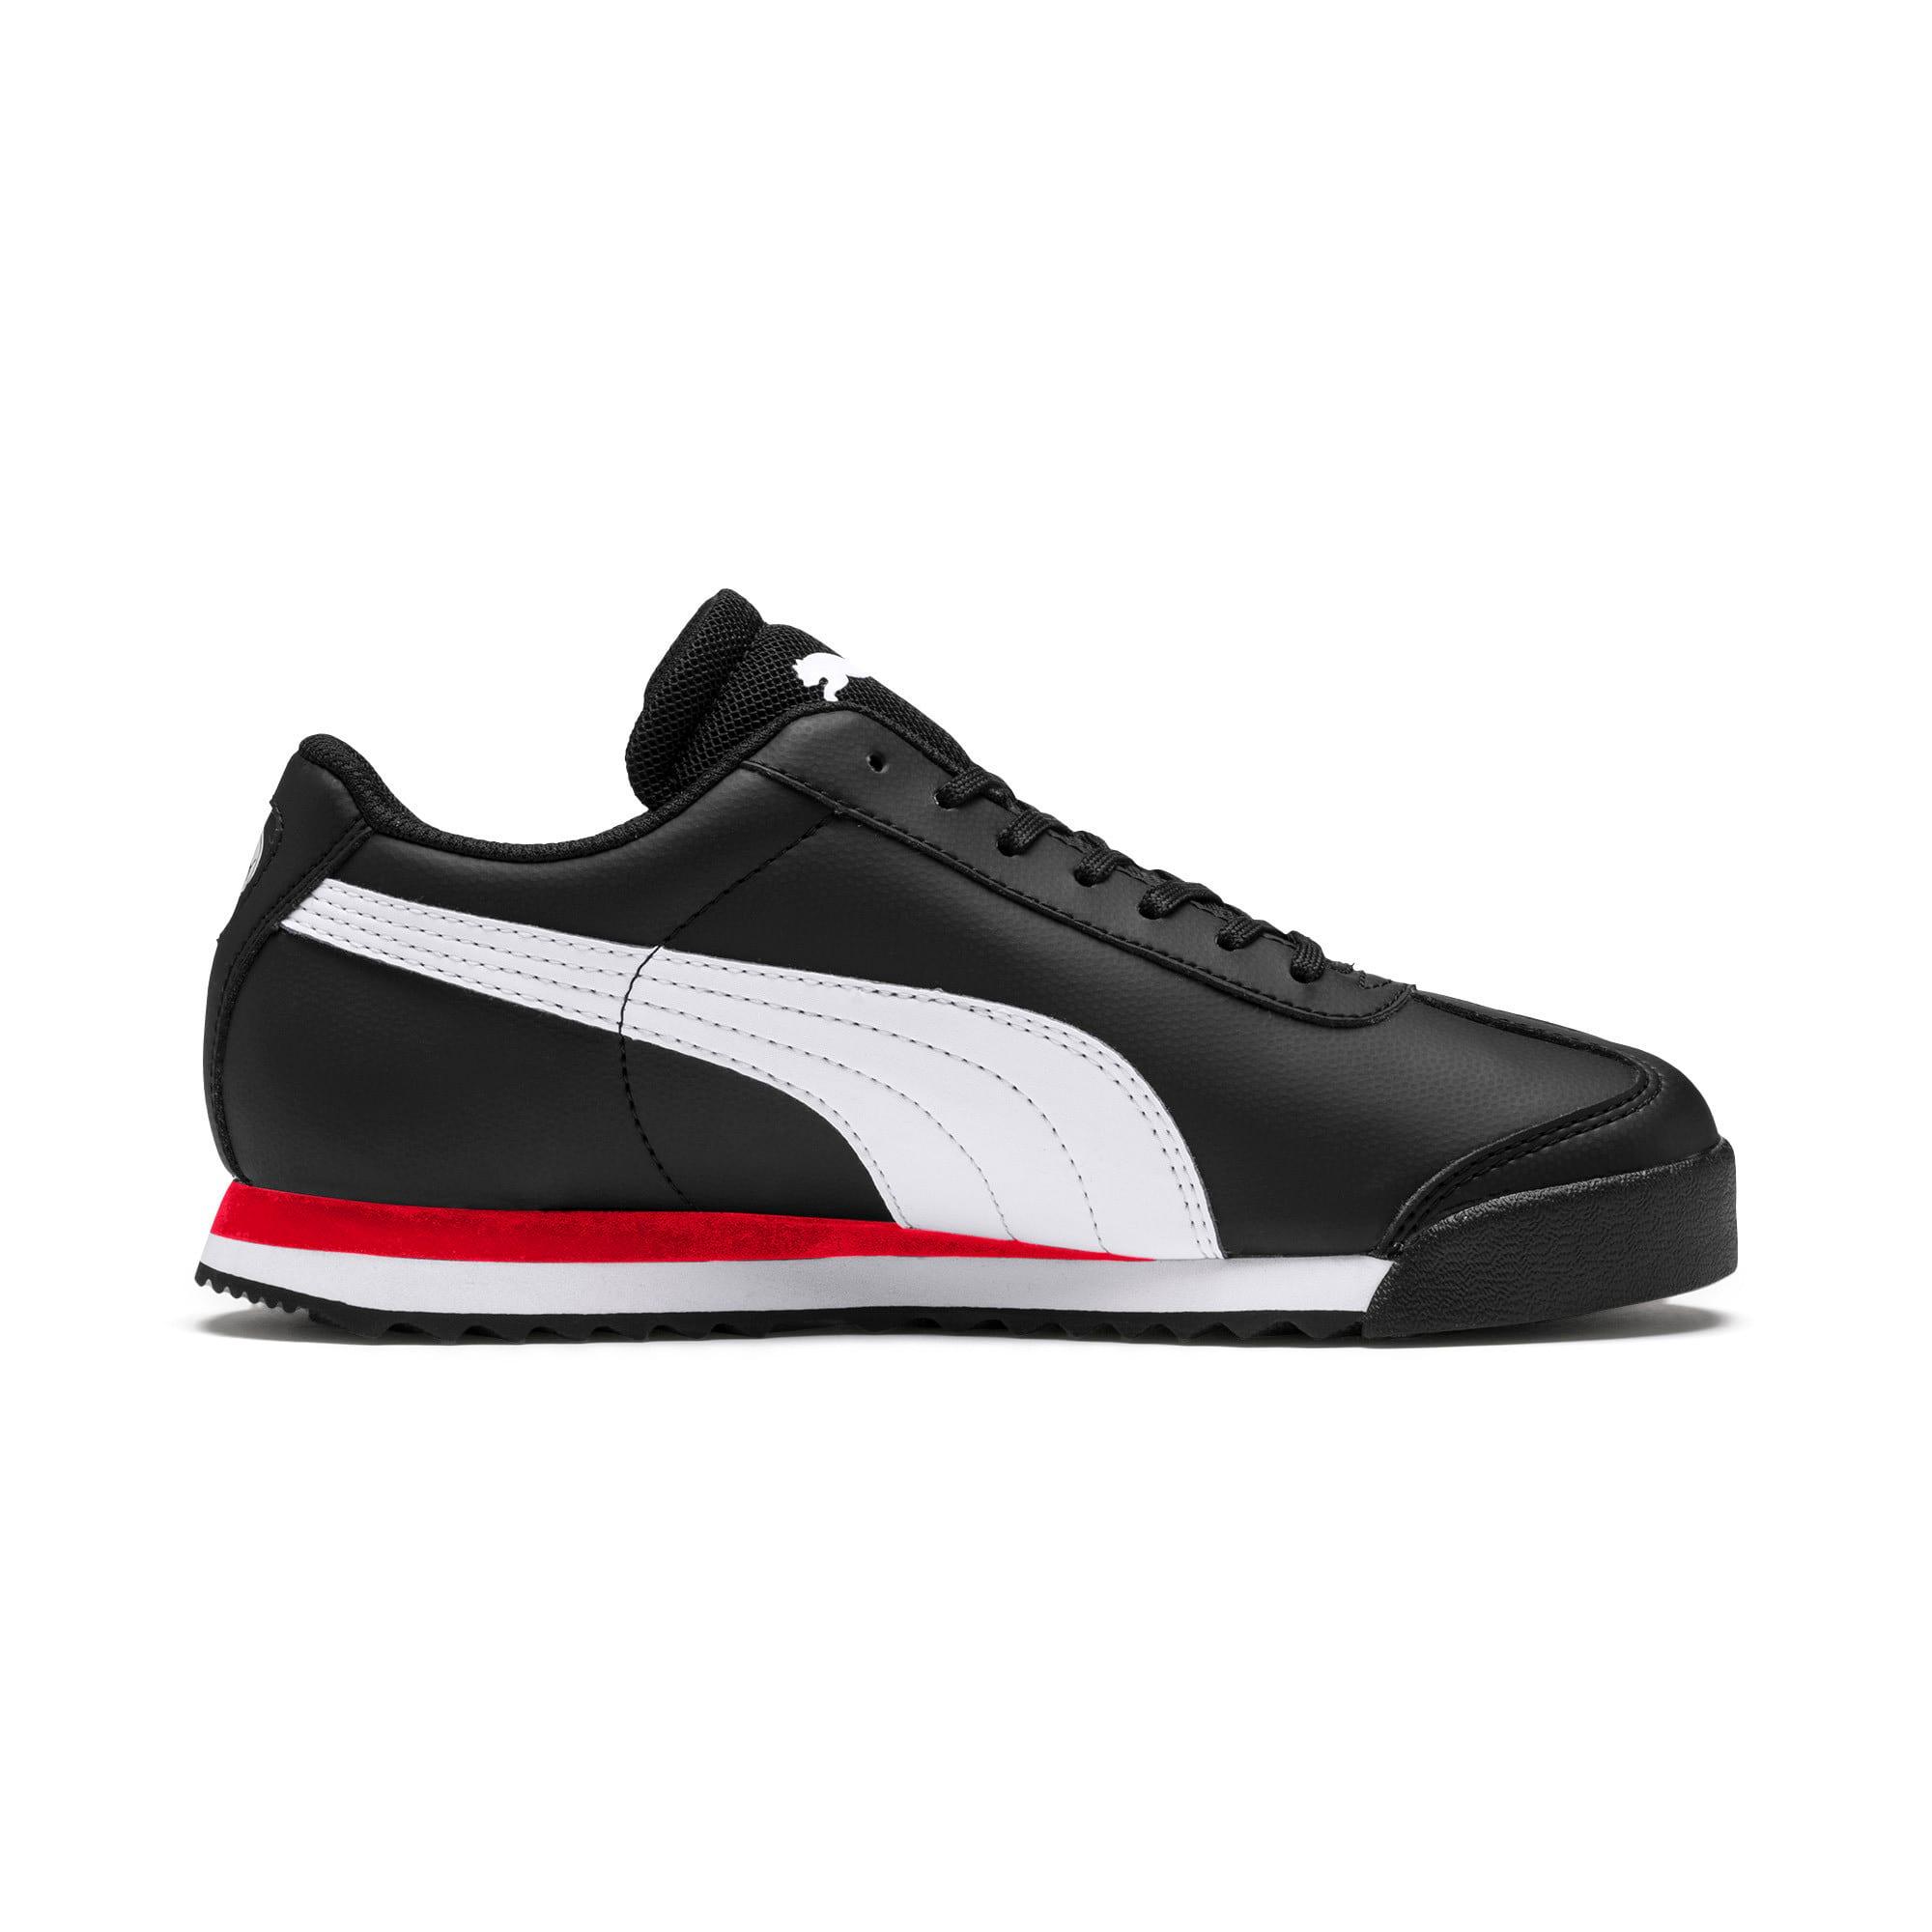 Thumbnail 5 of Scuderia Ferrari Roma Sneakers JR, Black-White-Rosso Corsa, medium